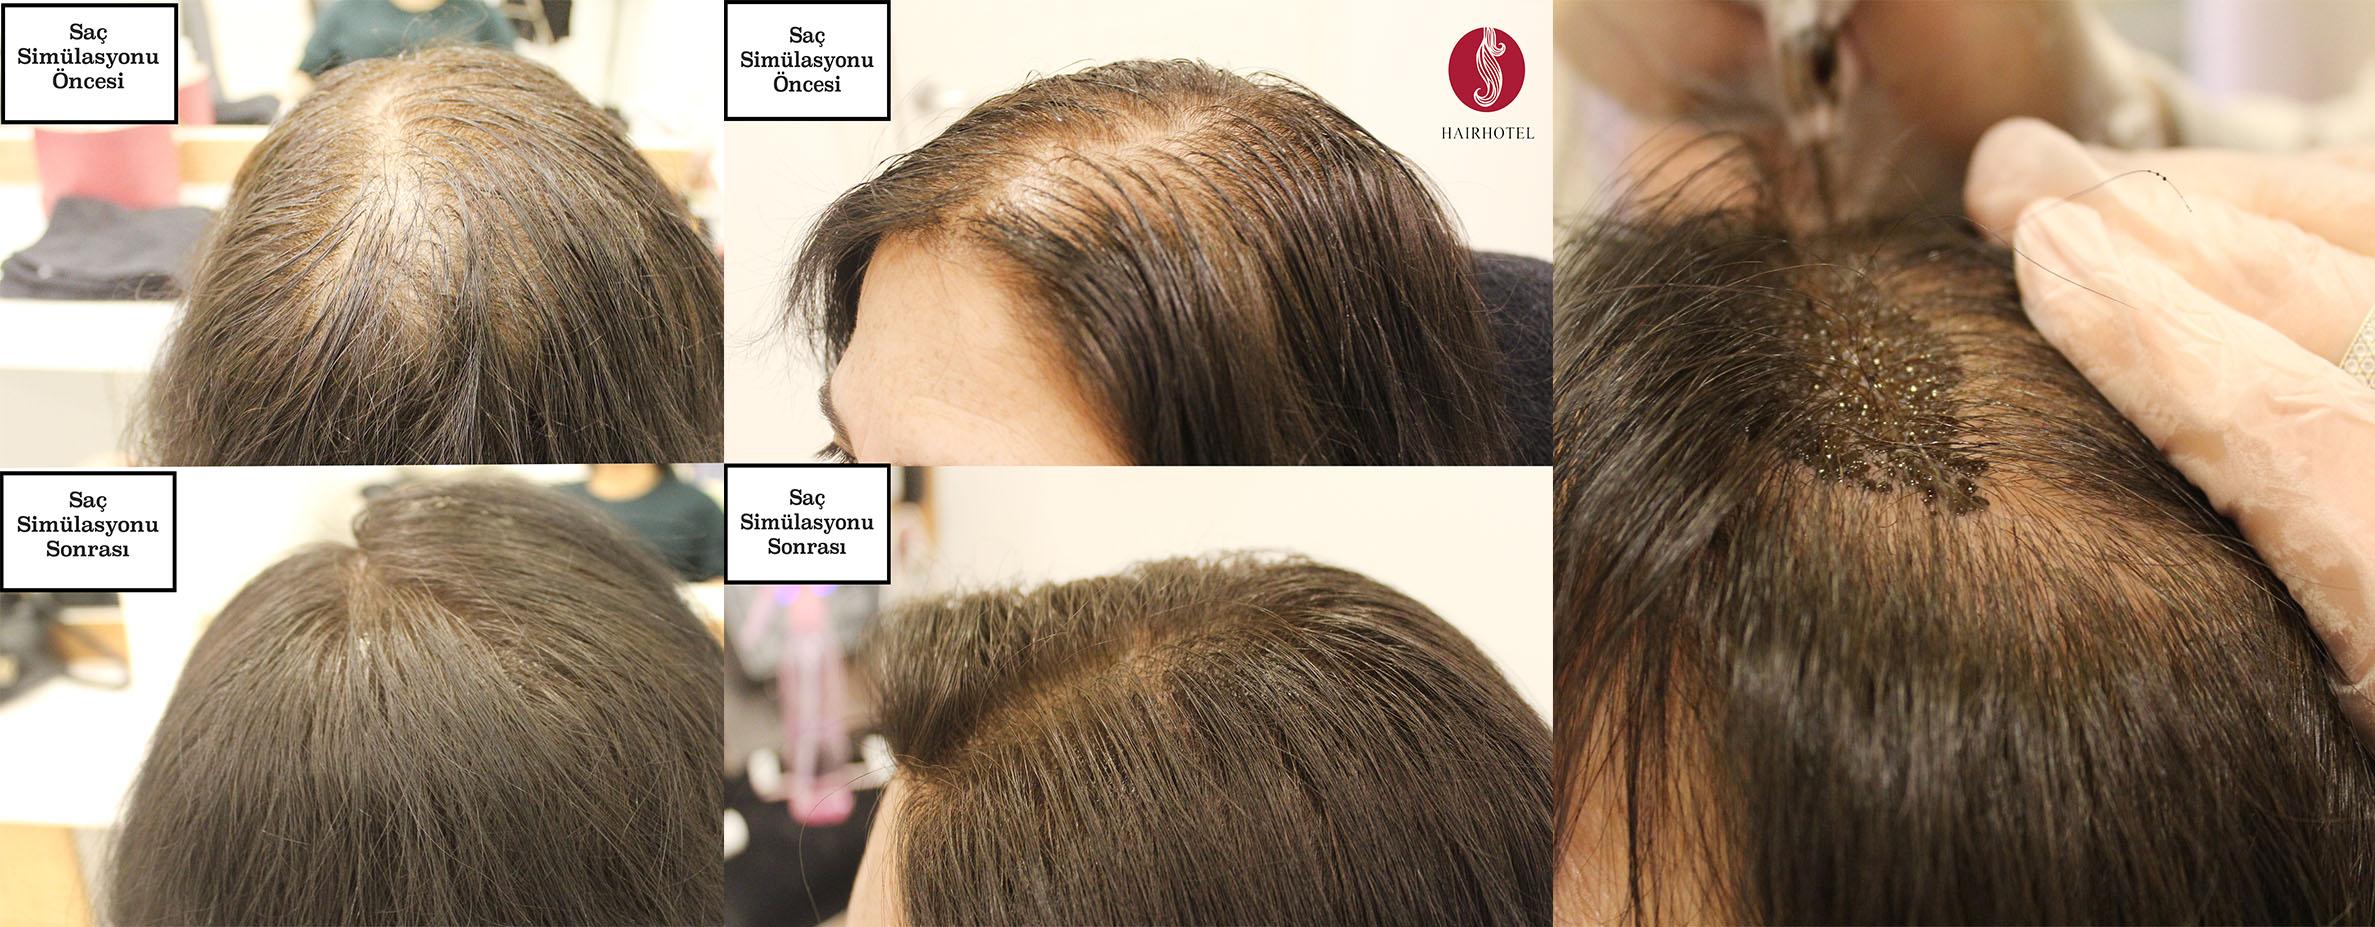 Is Hair Simulation Harmful?